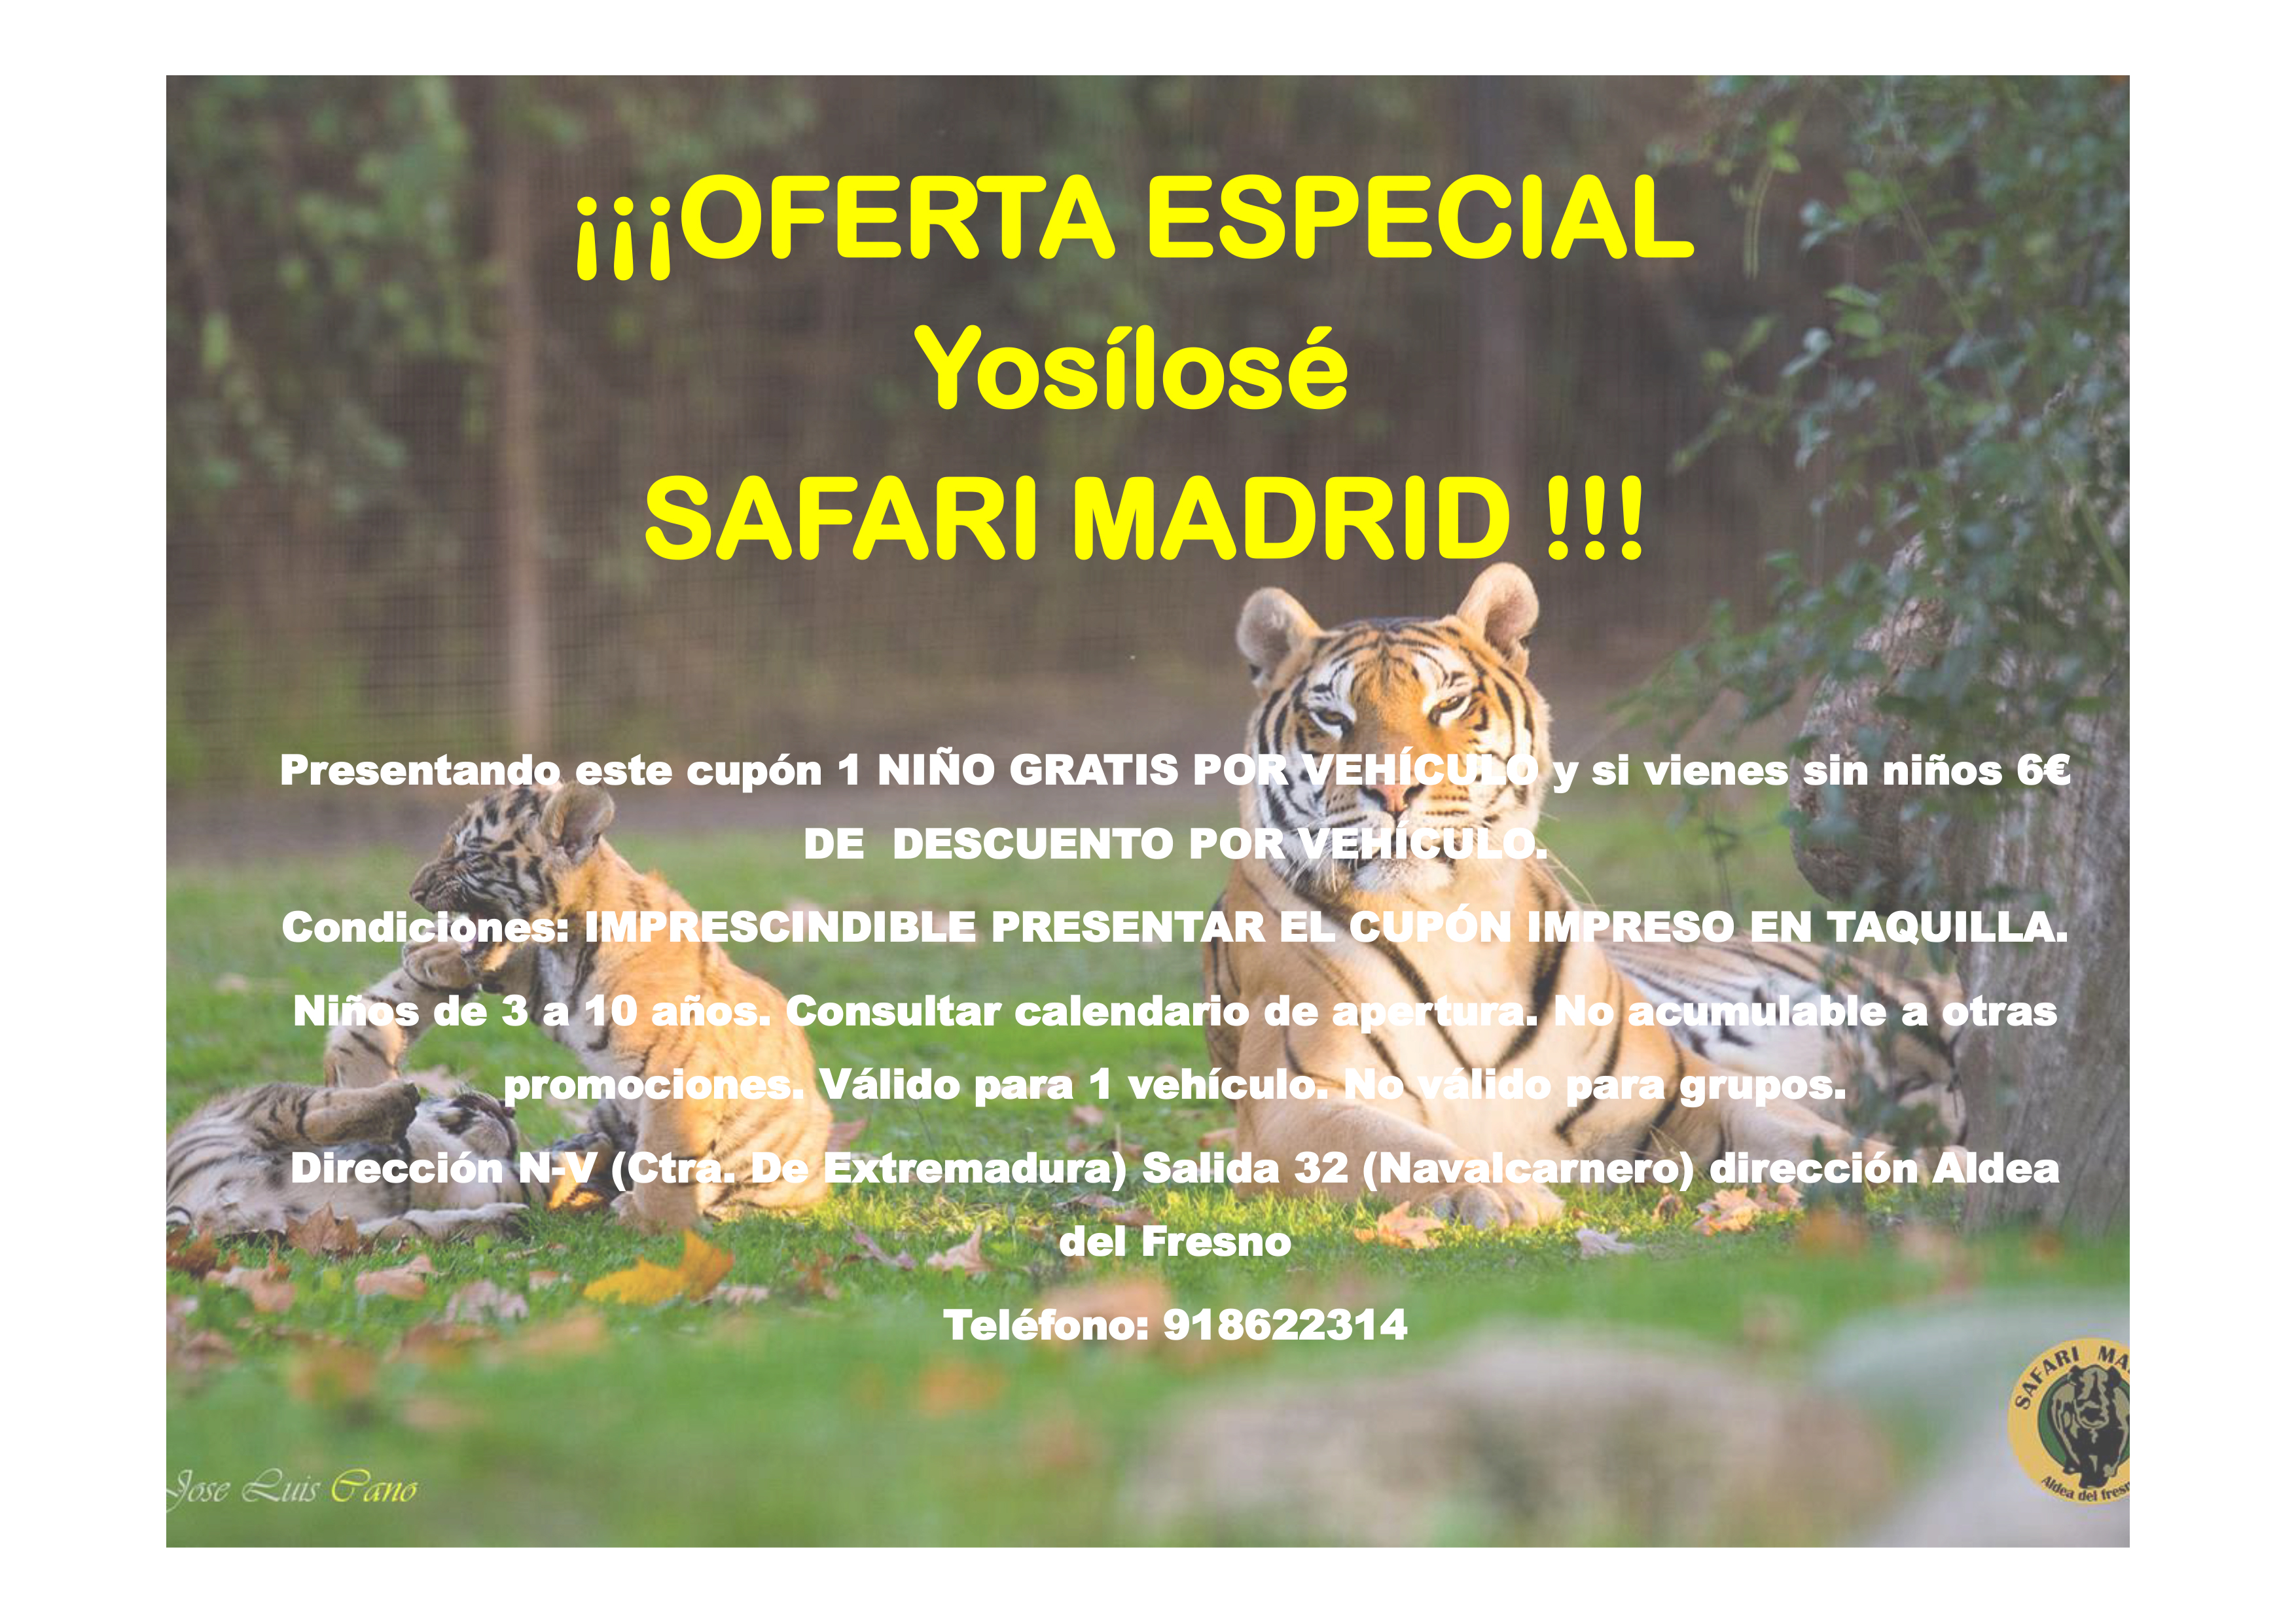 Safari Madrid | yosilose.com